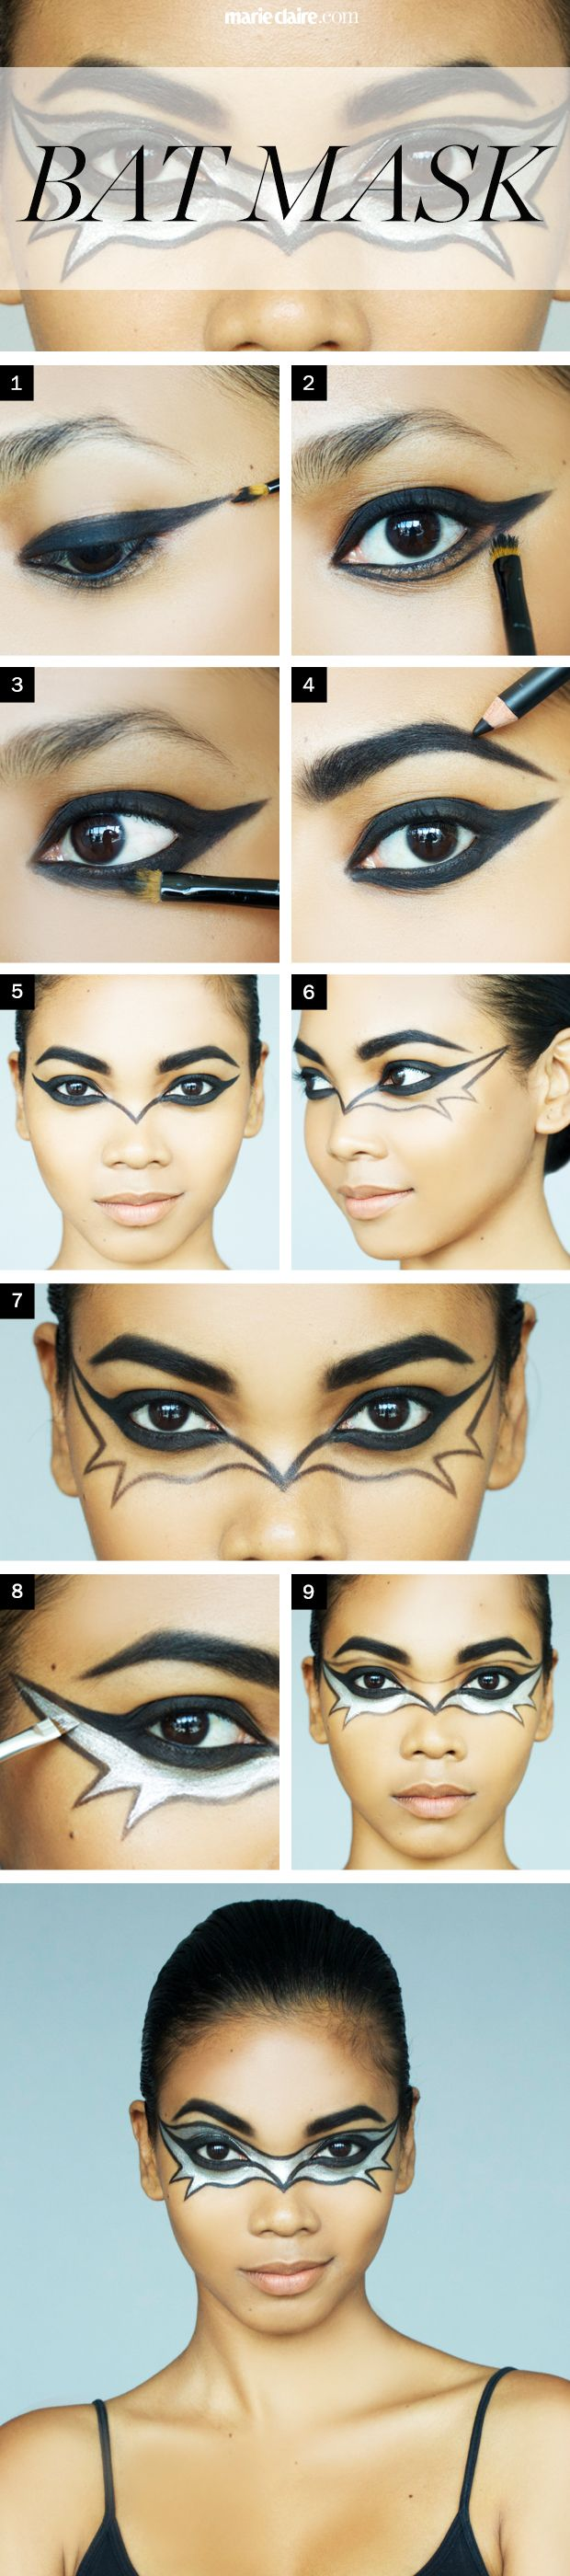 Hallowee Makeup How-To Bat Girl Mask - Halloween Makeup Ideas - Marie Claire